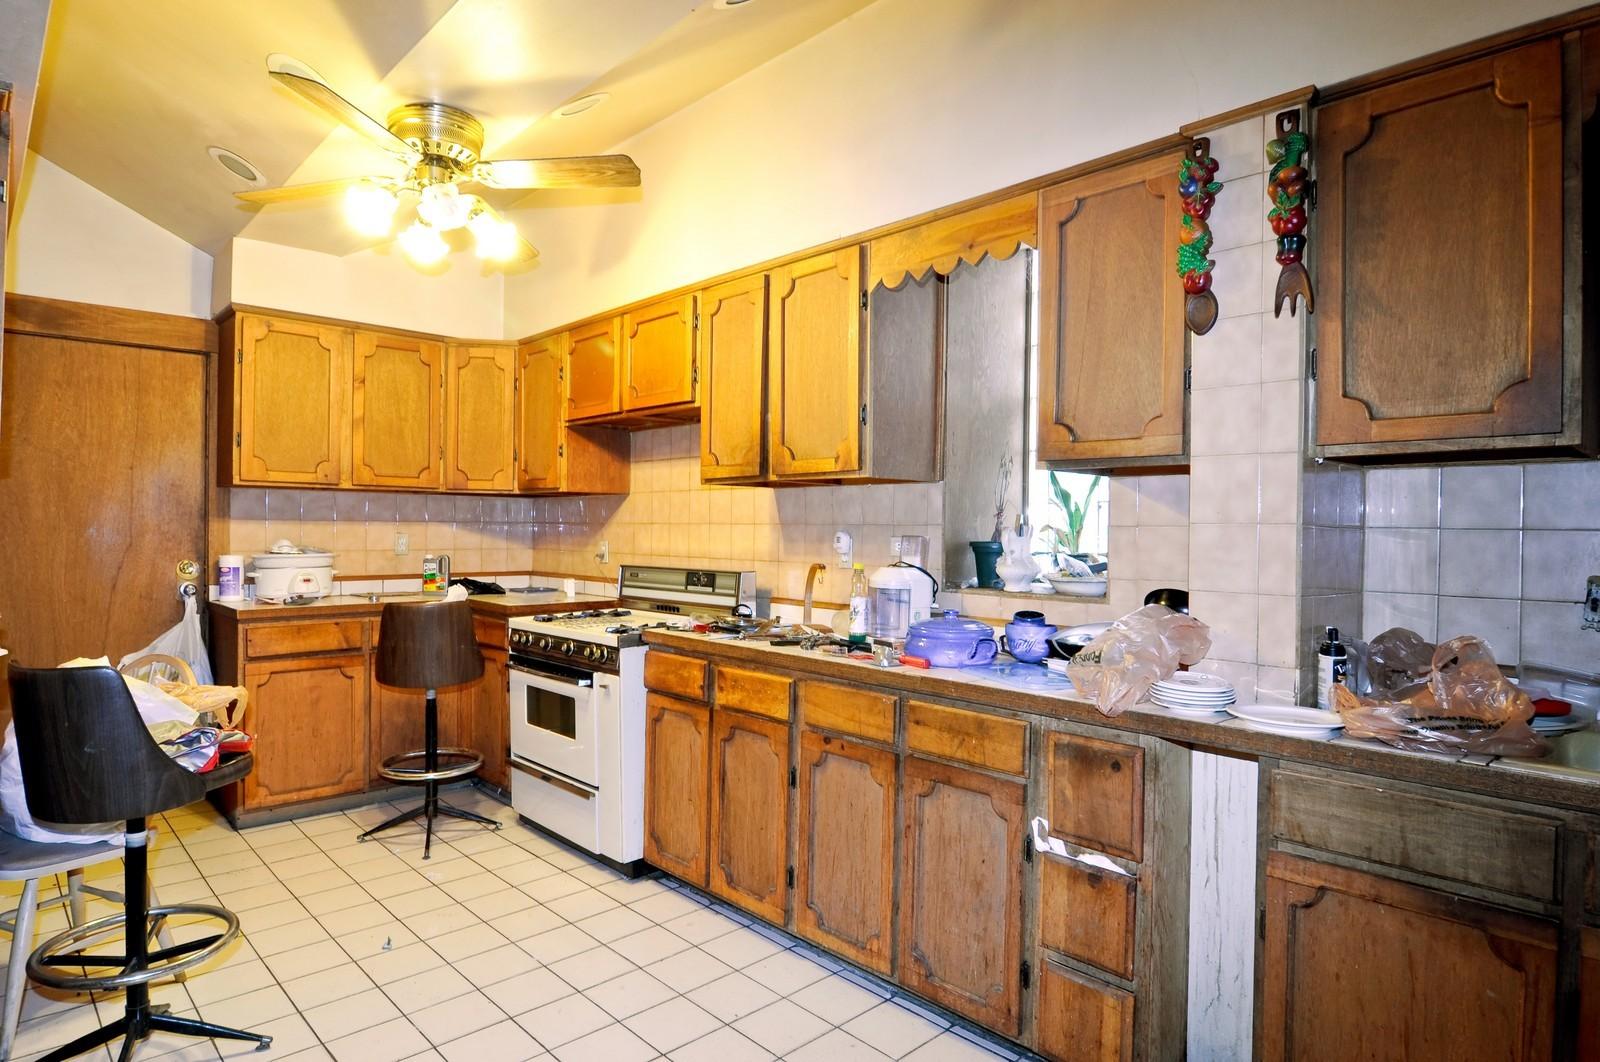 Real Estate Photography - 4419 W Jackson, Chicago, IL, 60624 - Kitchen